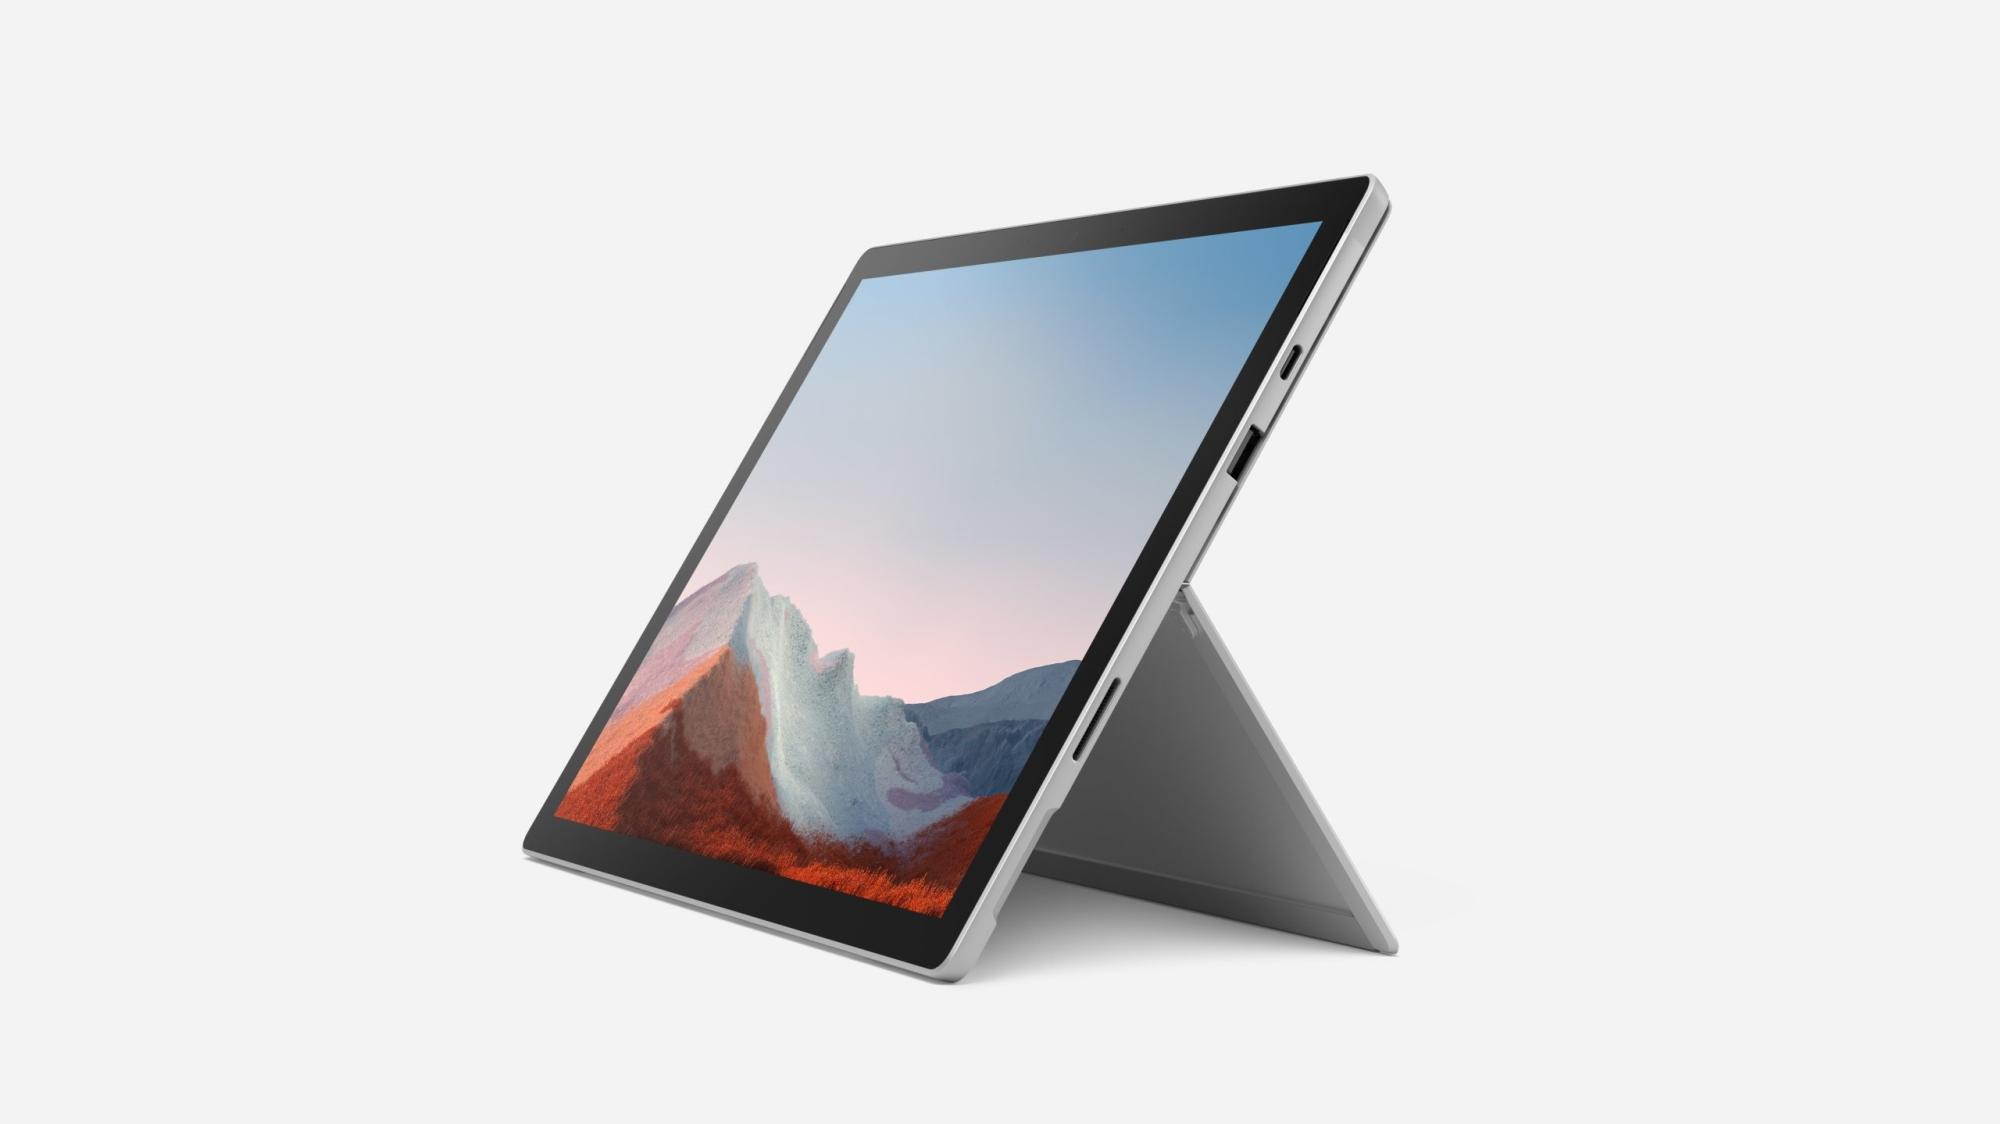 Surface Pro 7+ 128 Gb 31,2 Cm (12.3) Intel Core I3-11xxx 8 Gb Wi-fi 6 (802.11ax) Windows 10 Pro Platino